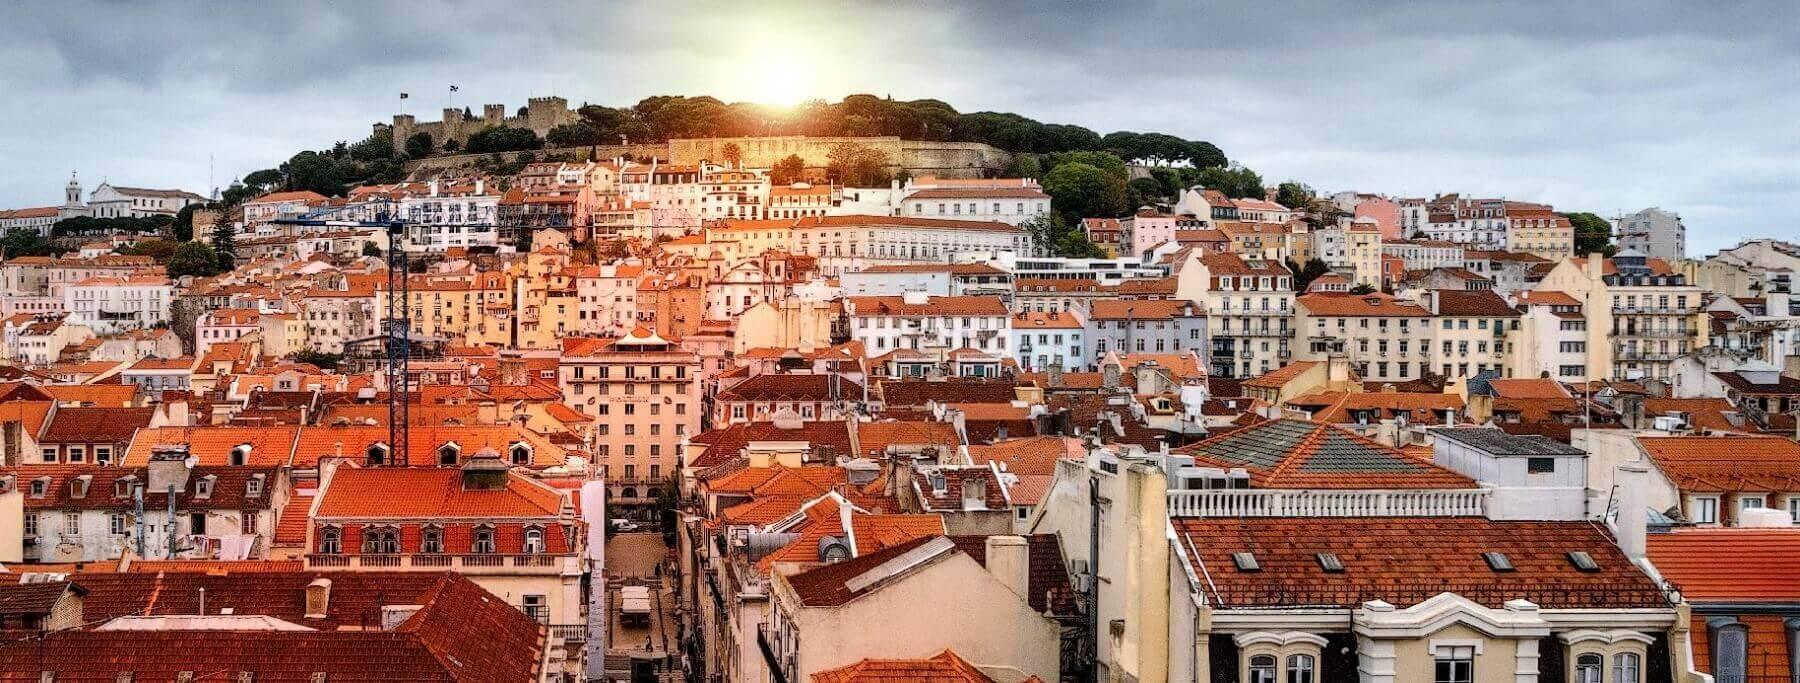 Lisboa - Prior Velho